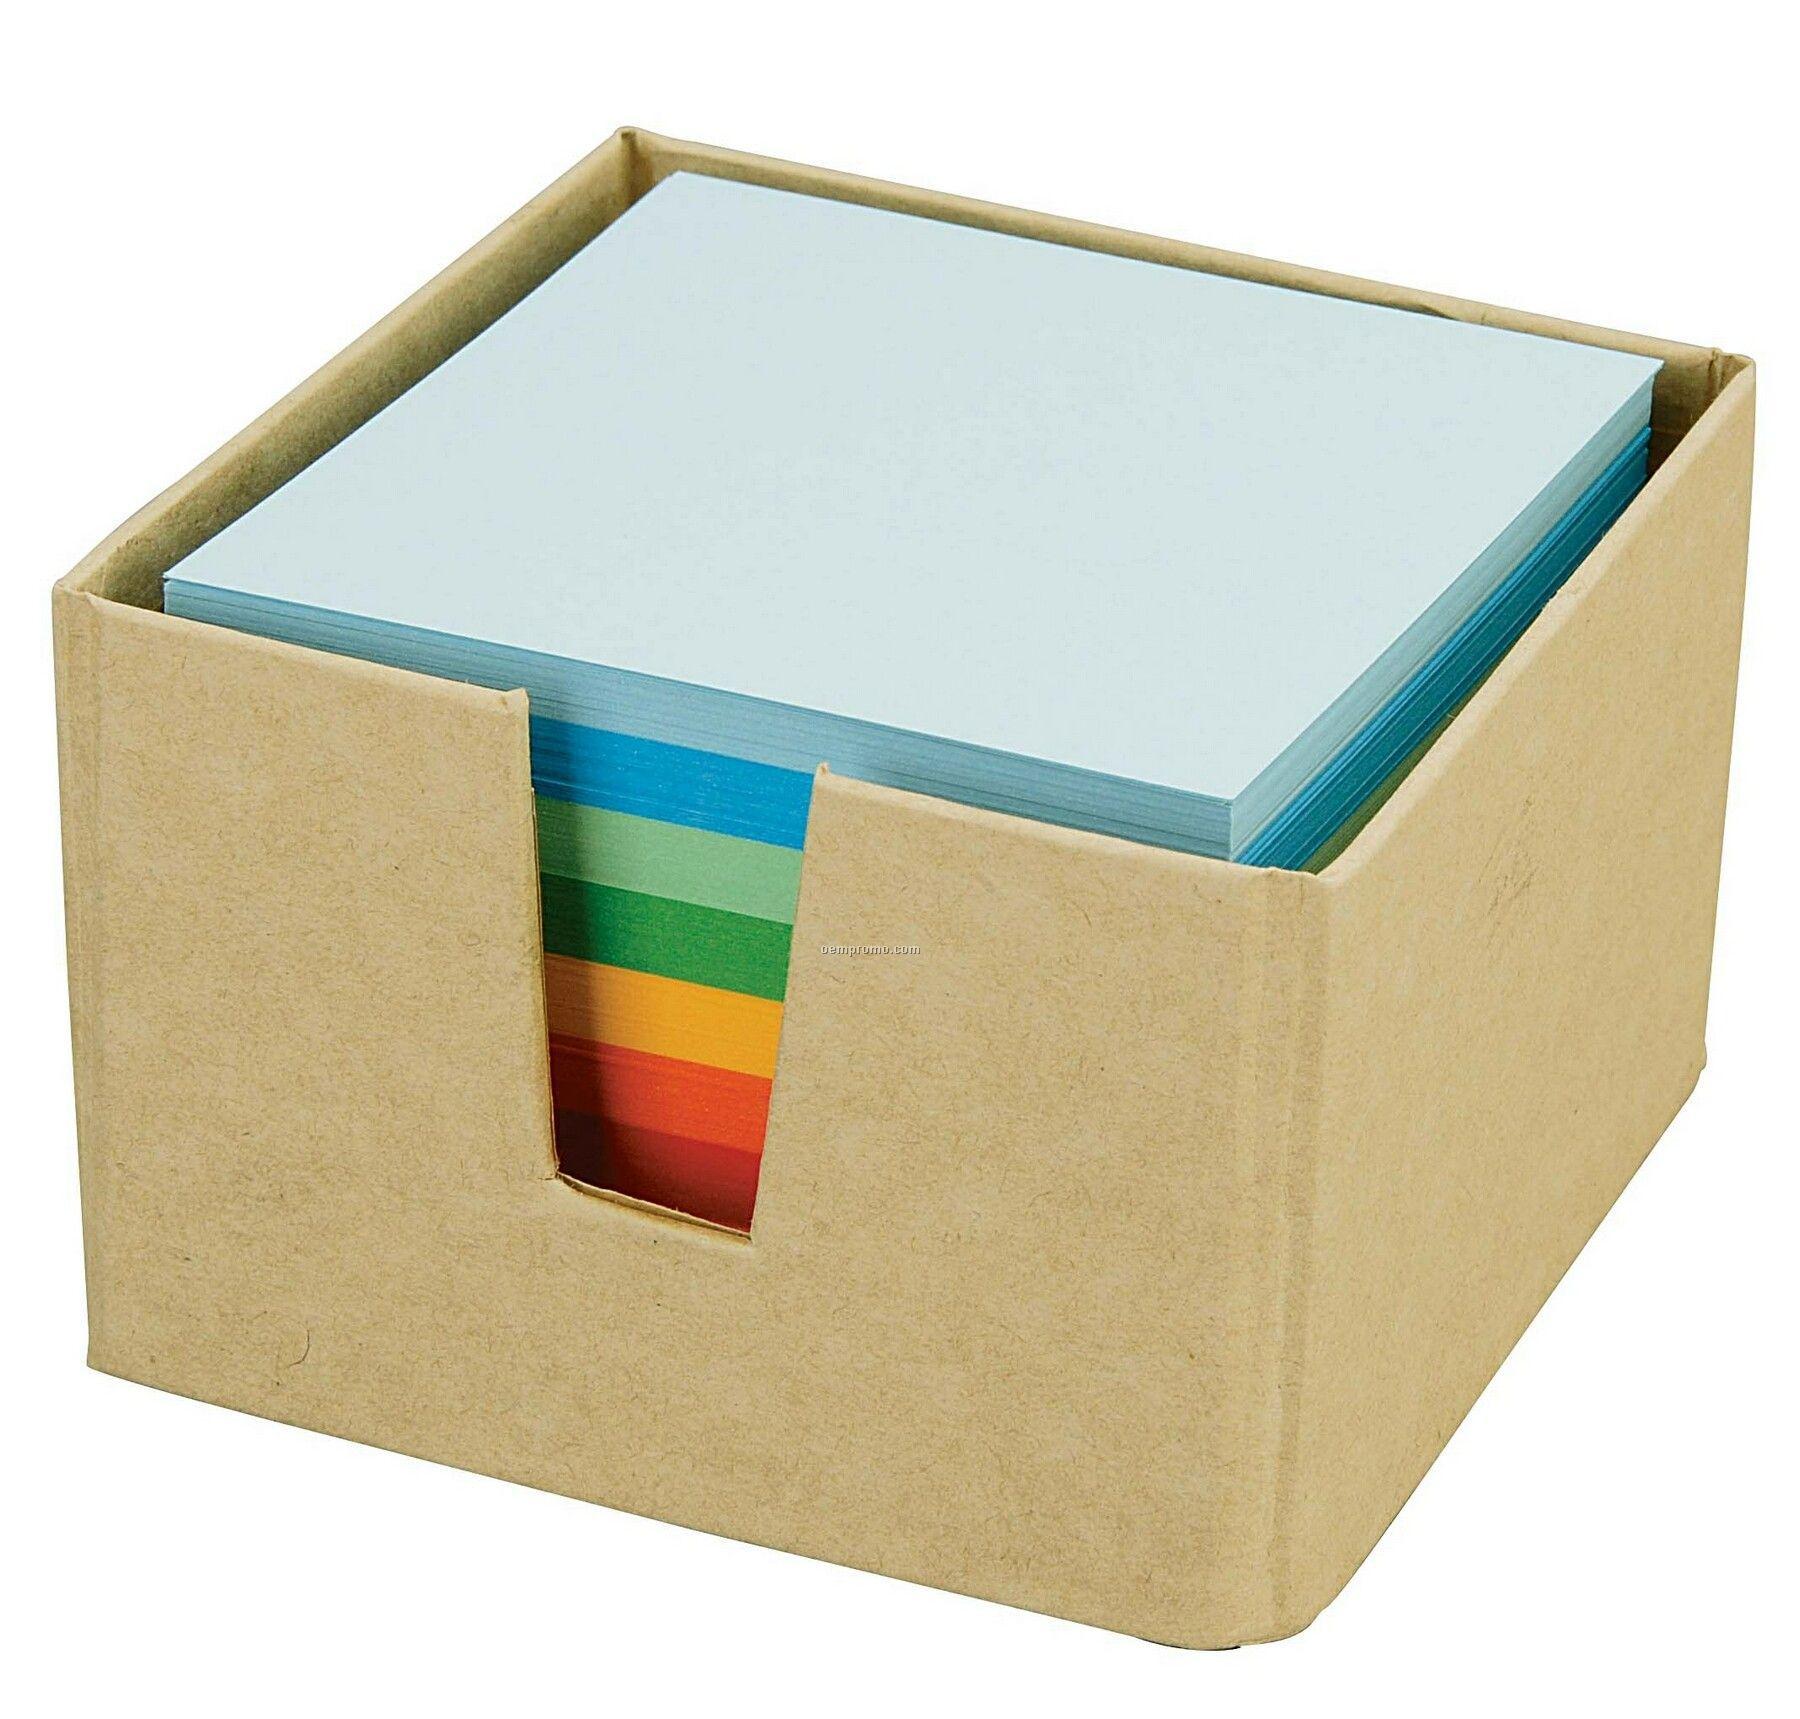 Econ-o-line Cardboard Memo Holder